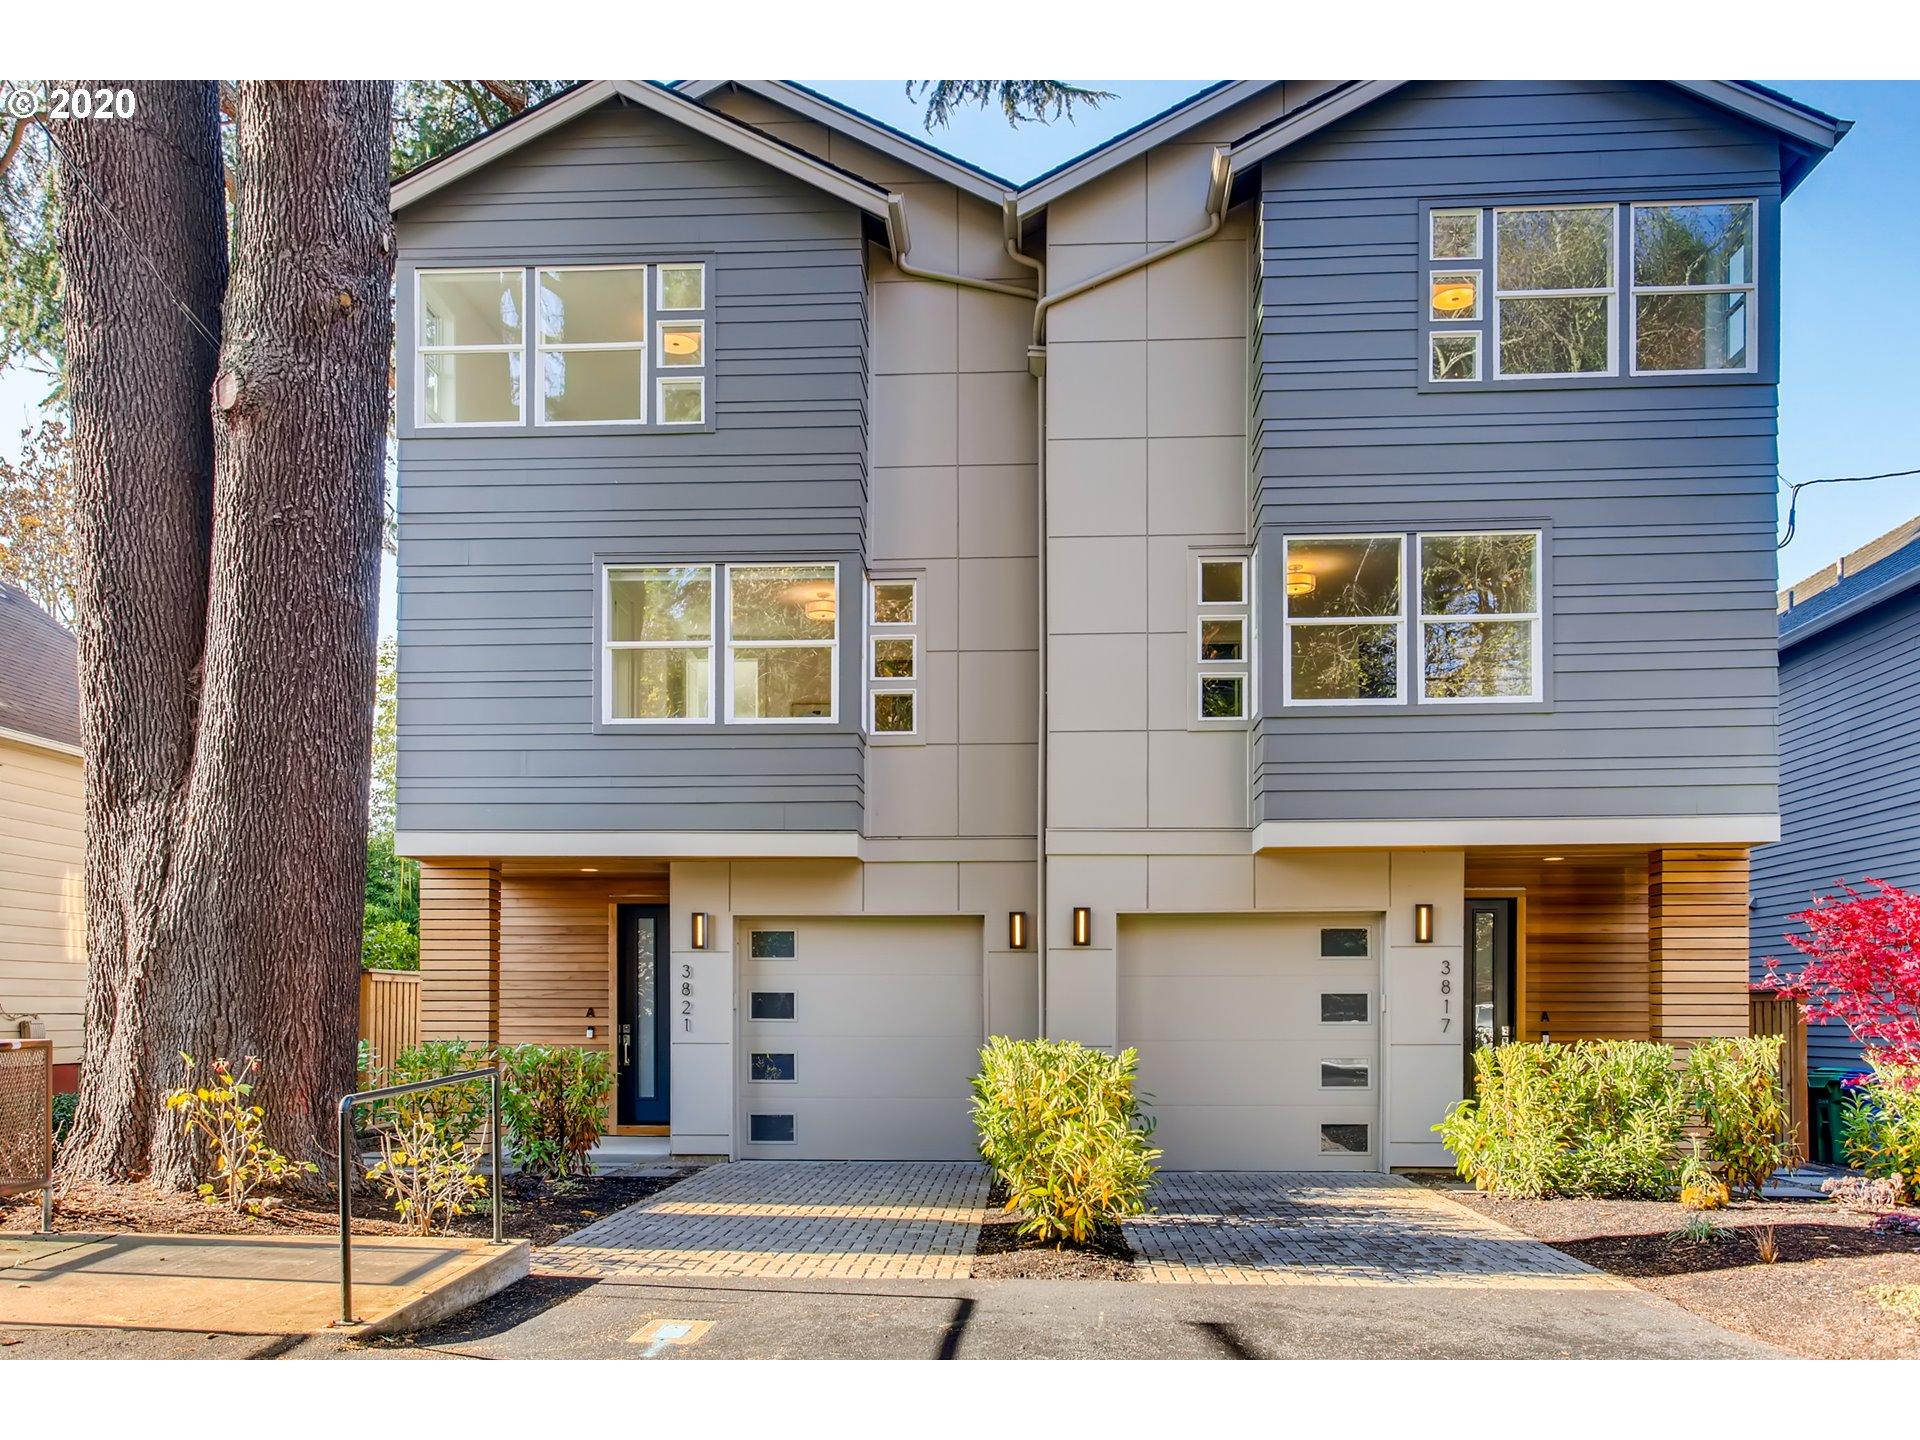 3817 SE 43rd AVE, Portland, OR 97206